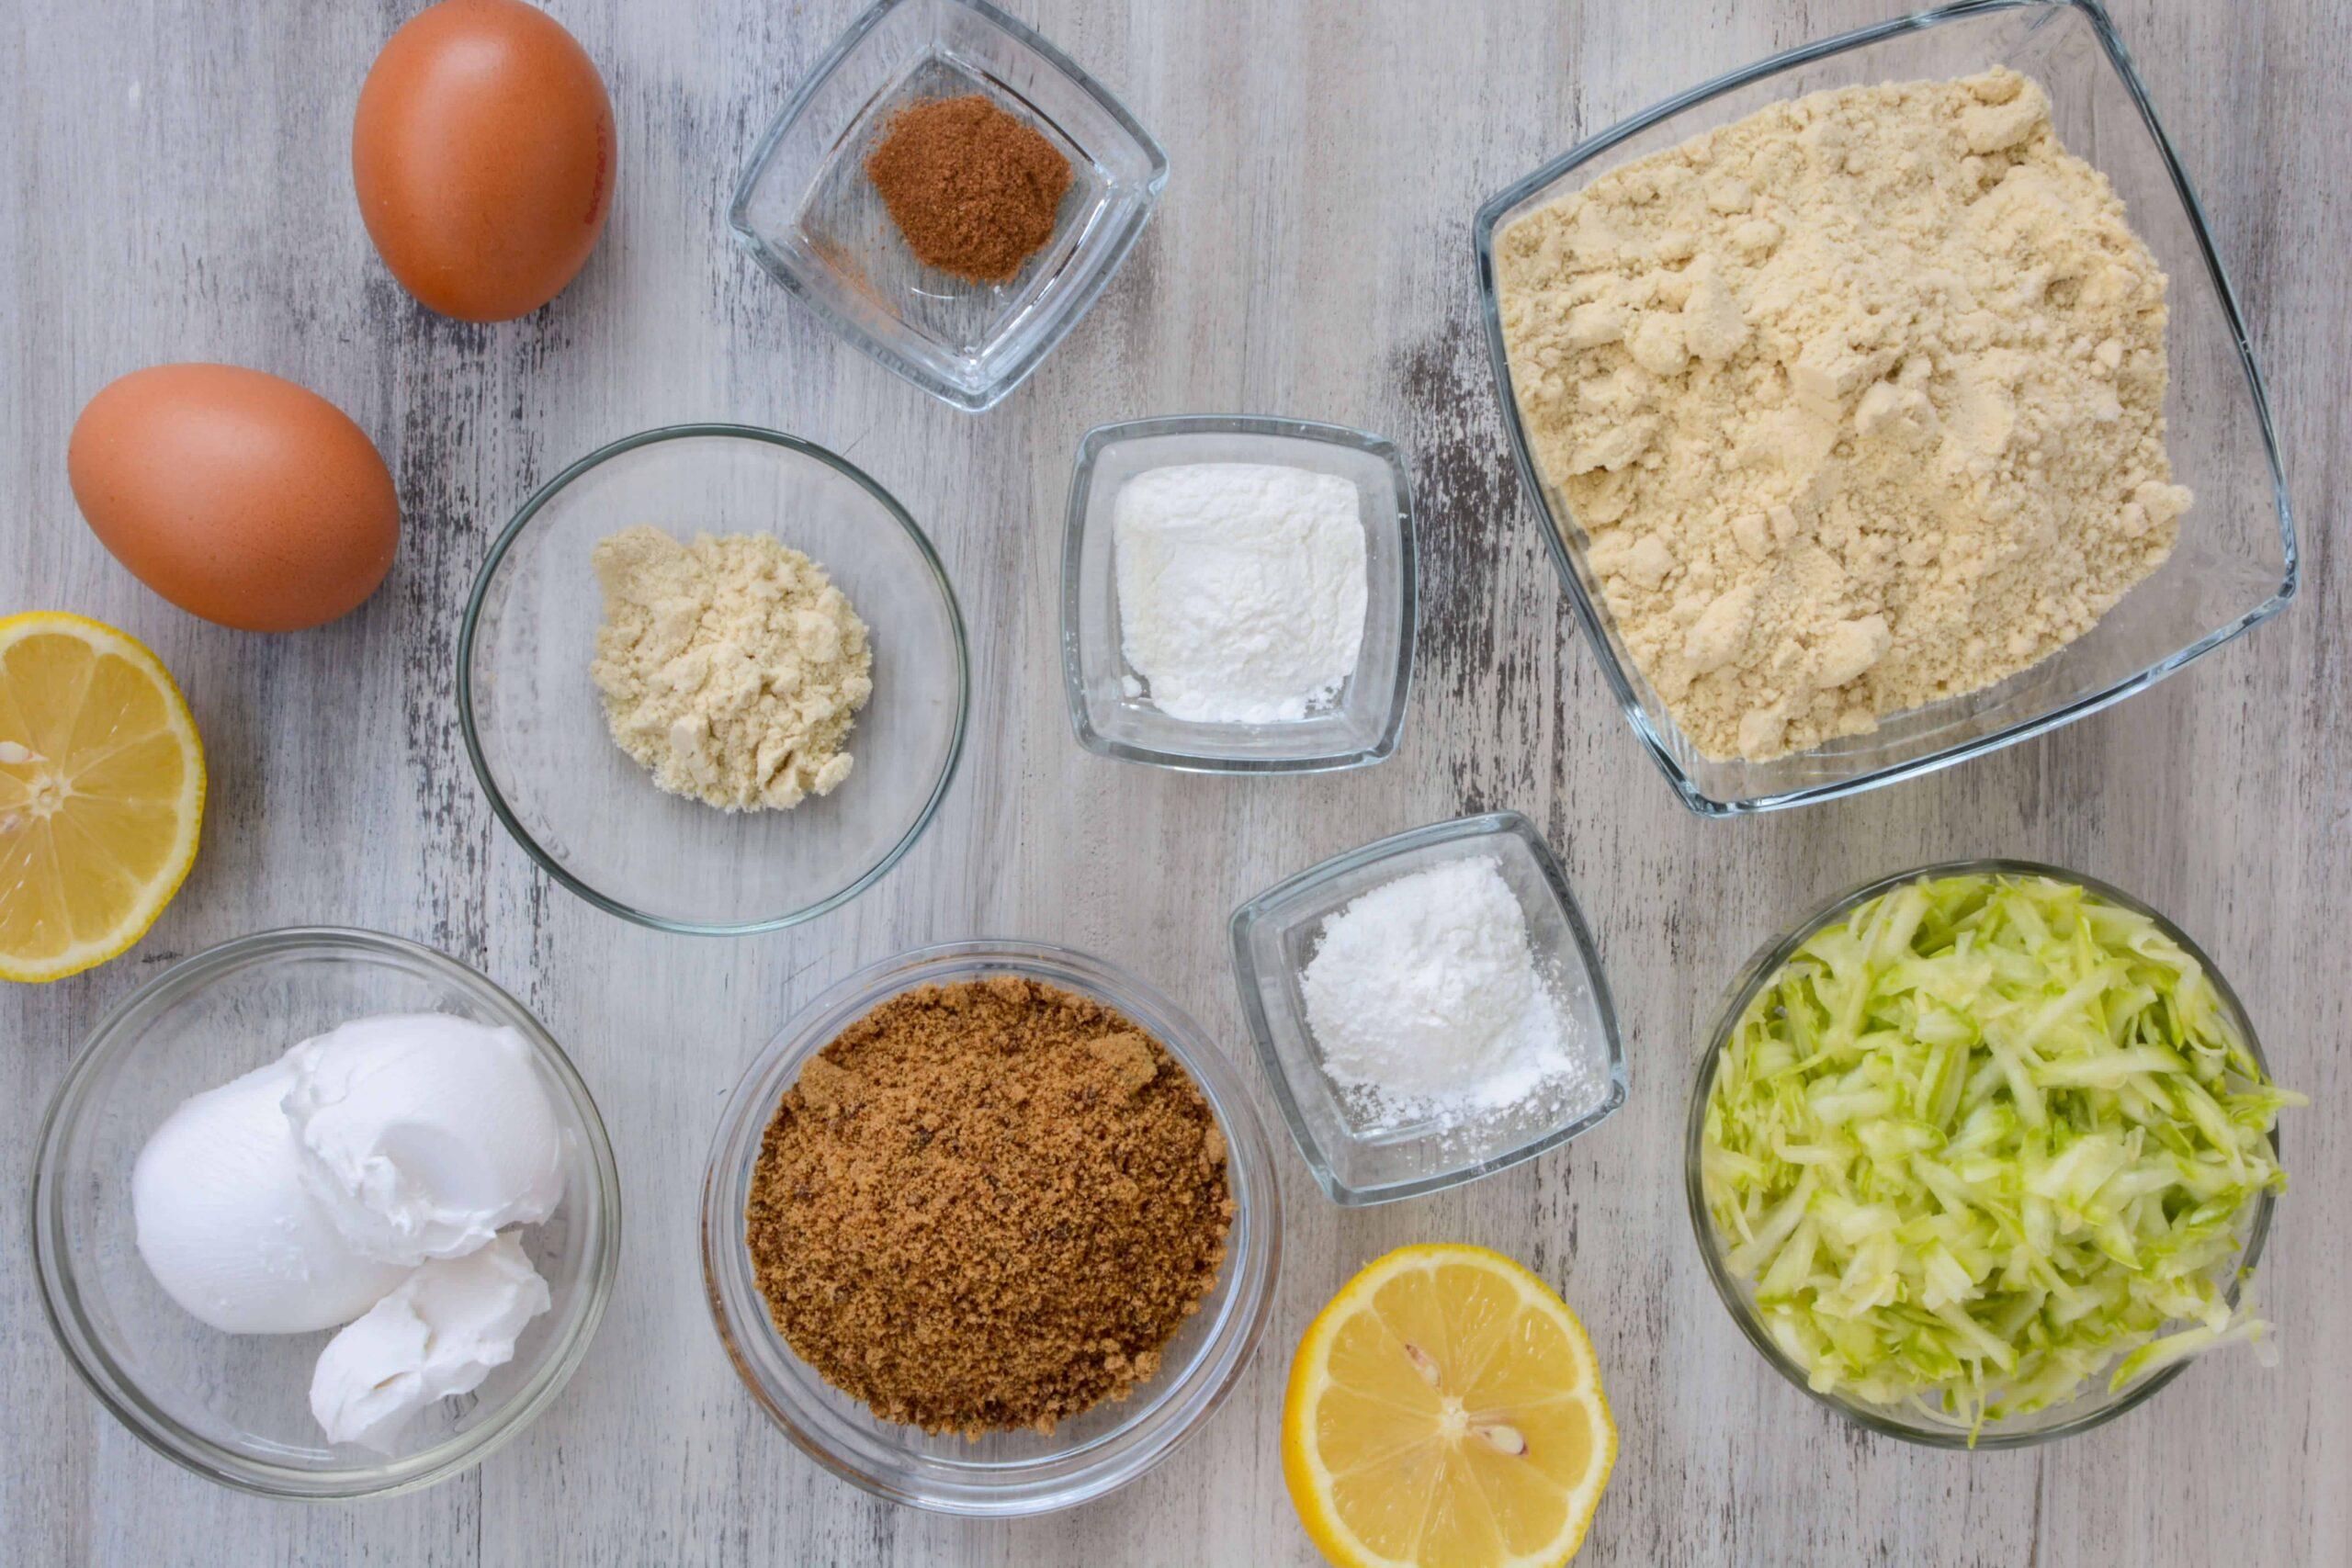 ingredients to make keto apple pie